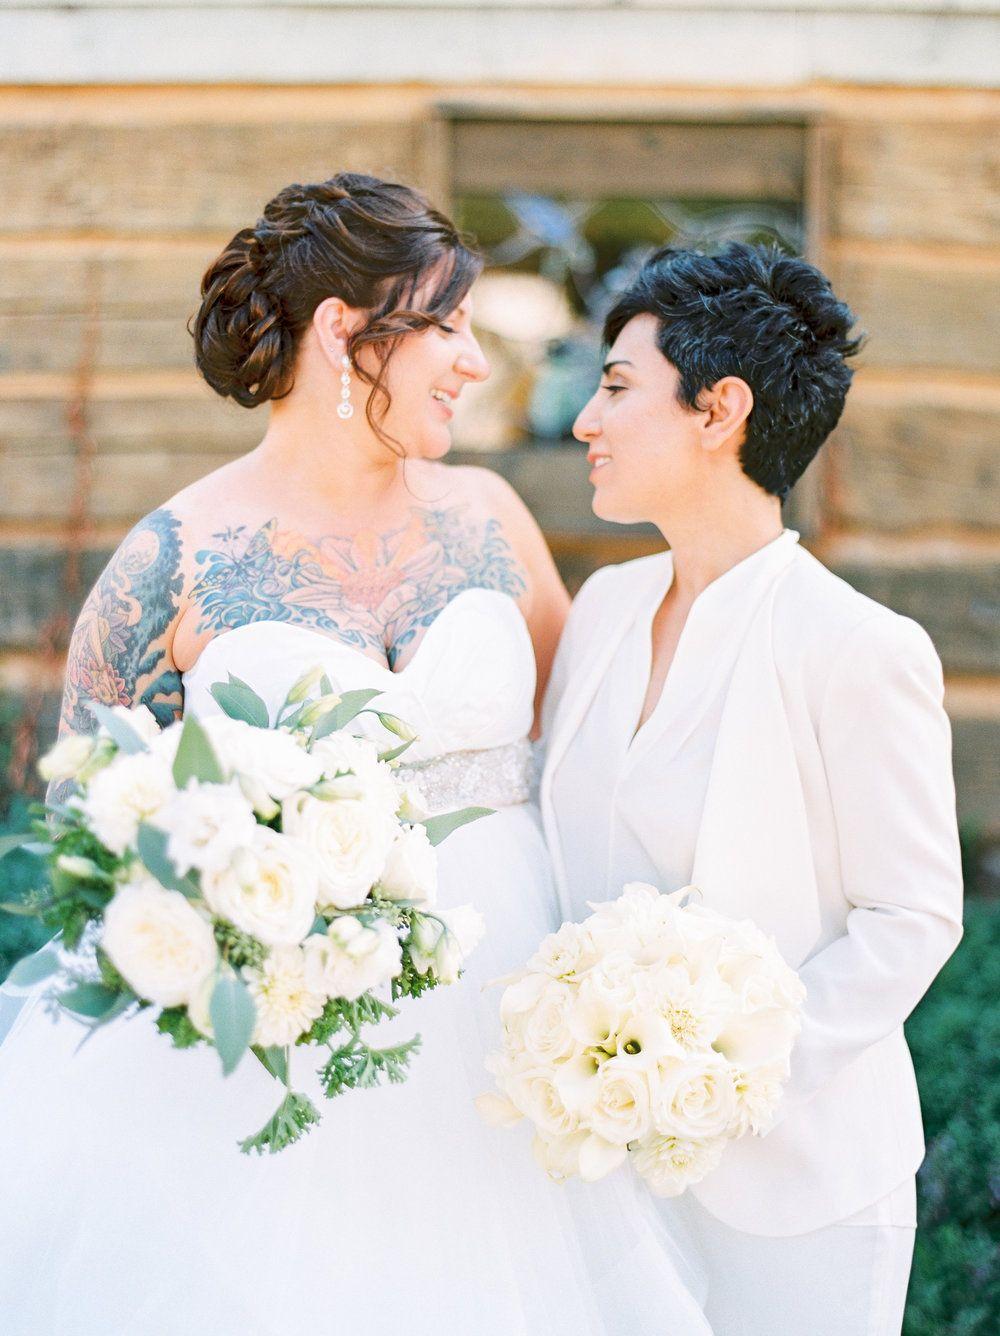 Amy's wedding dress  Real Couples  Sugarloaf Mountain Wedding Sally  Sophia  Real